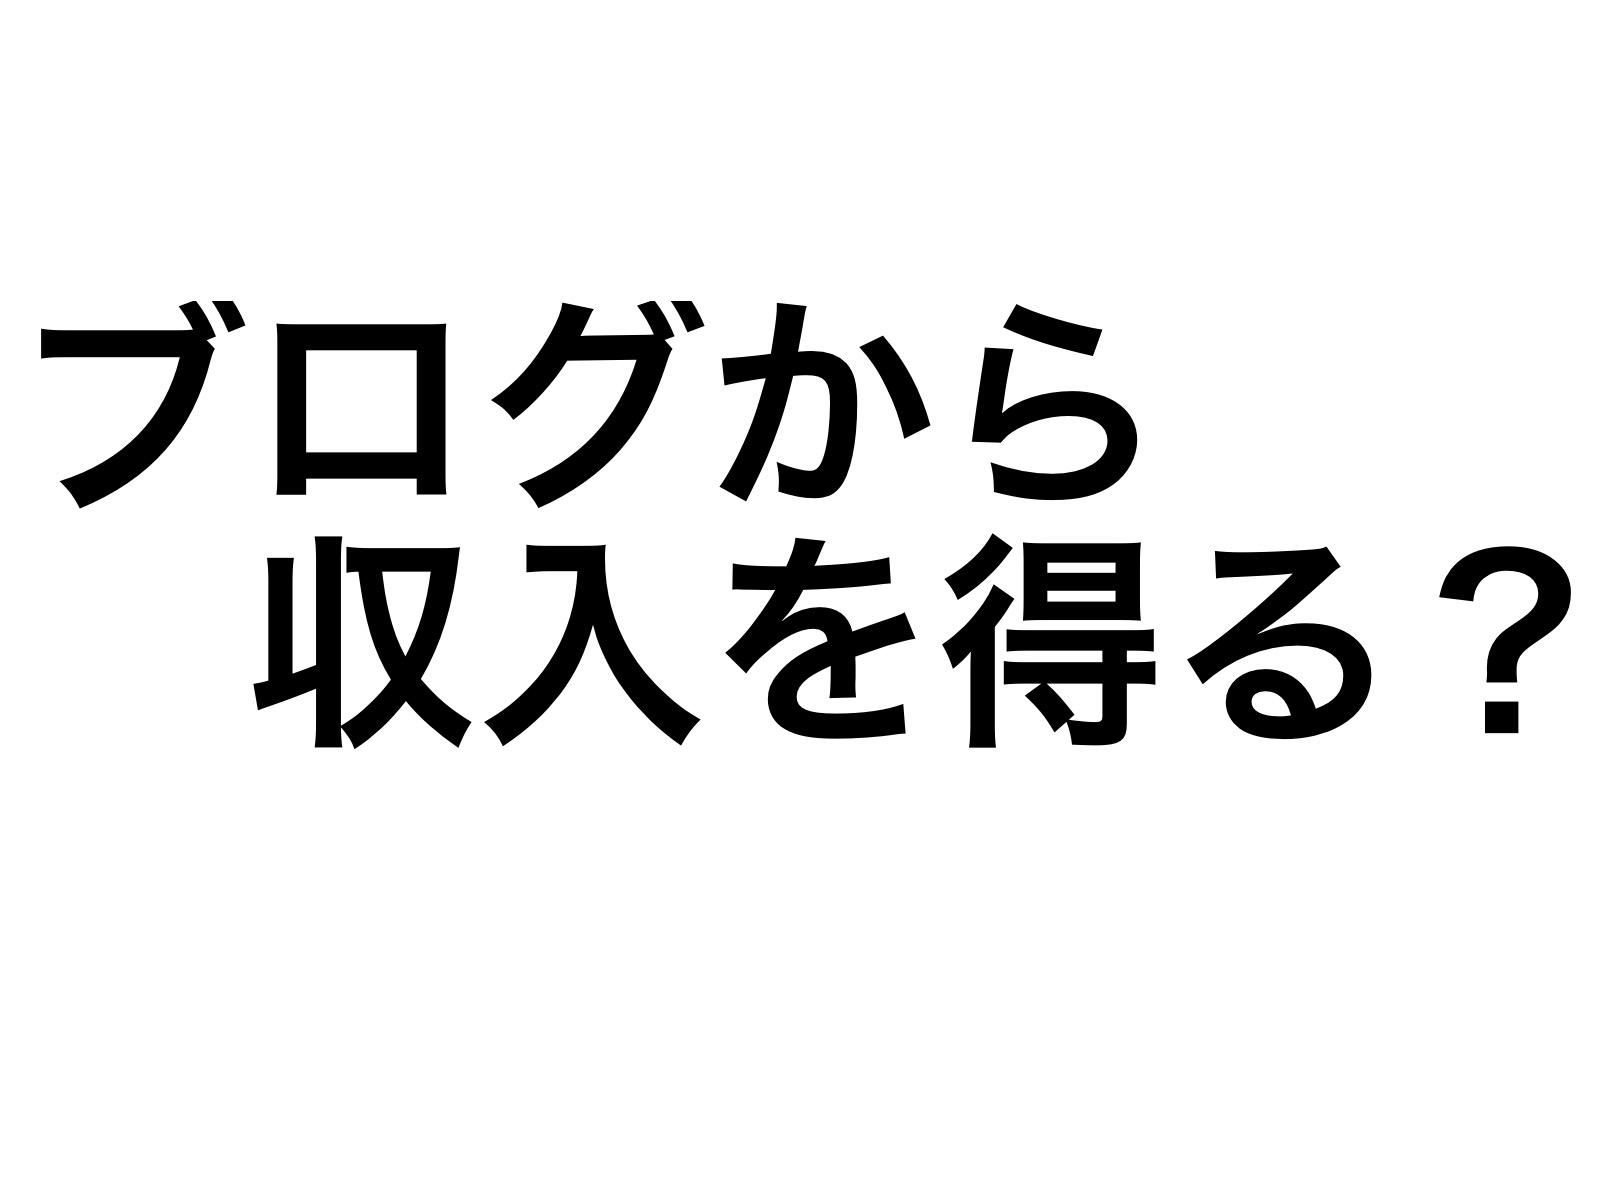 2017 05 04 12 15 21